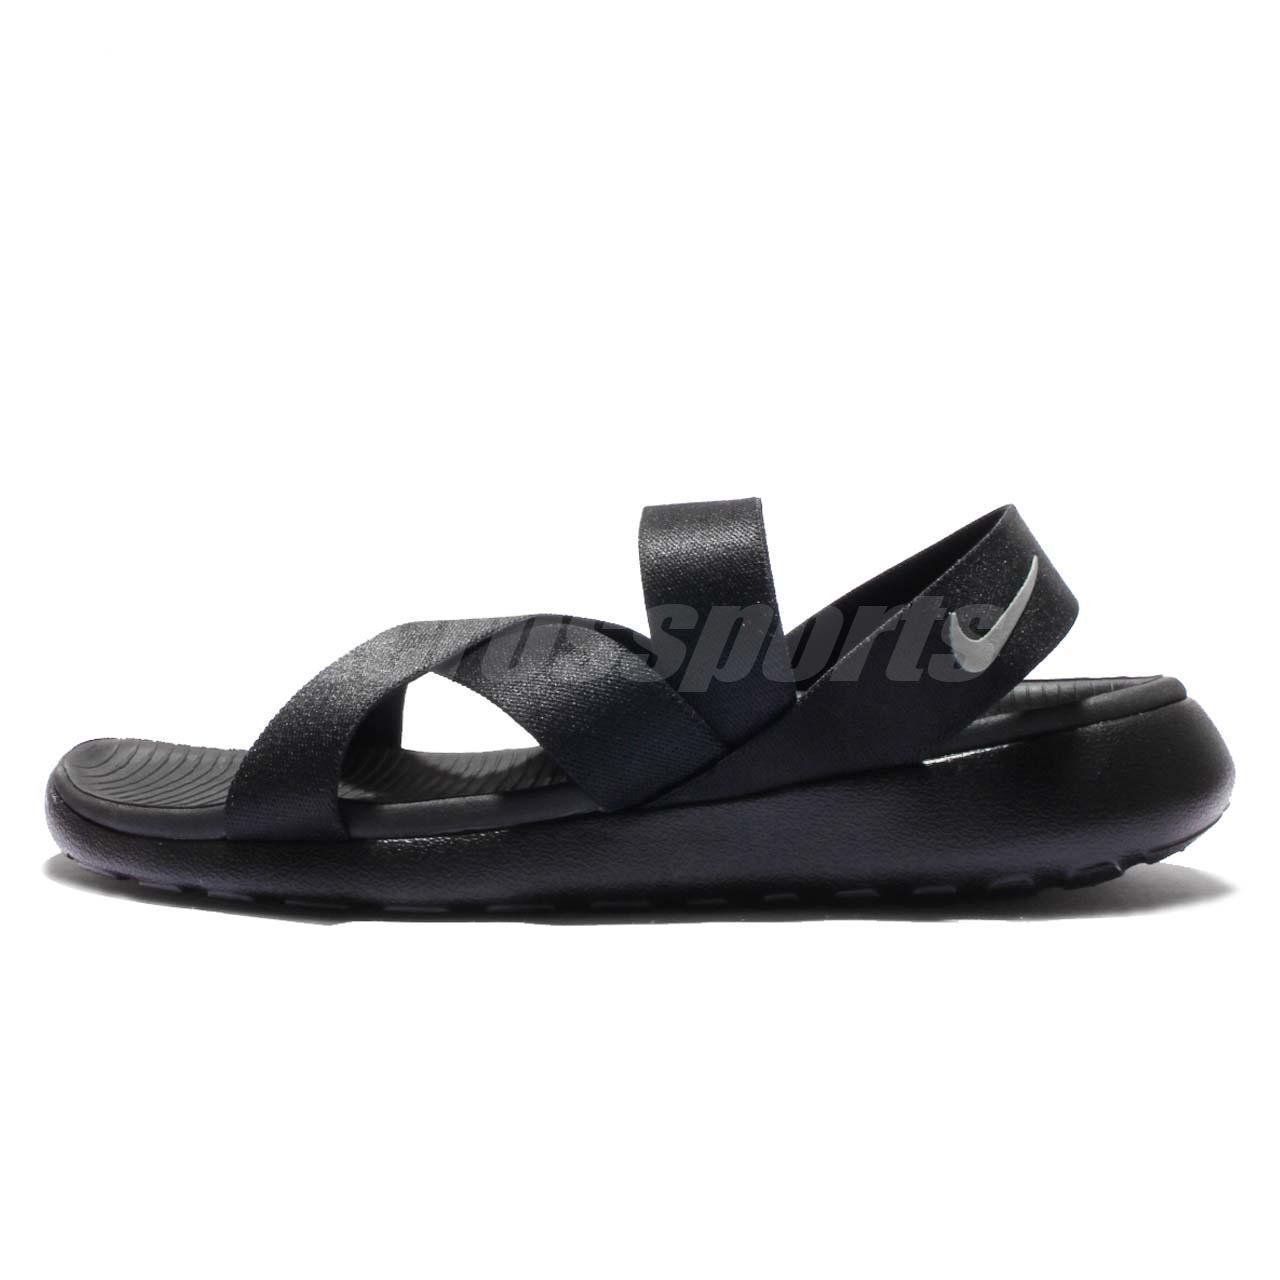 yhreq Wmns Nike Roshe One Sandal Black Grey Womens Benassi 830584-001